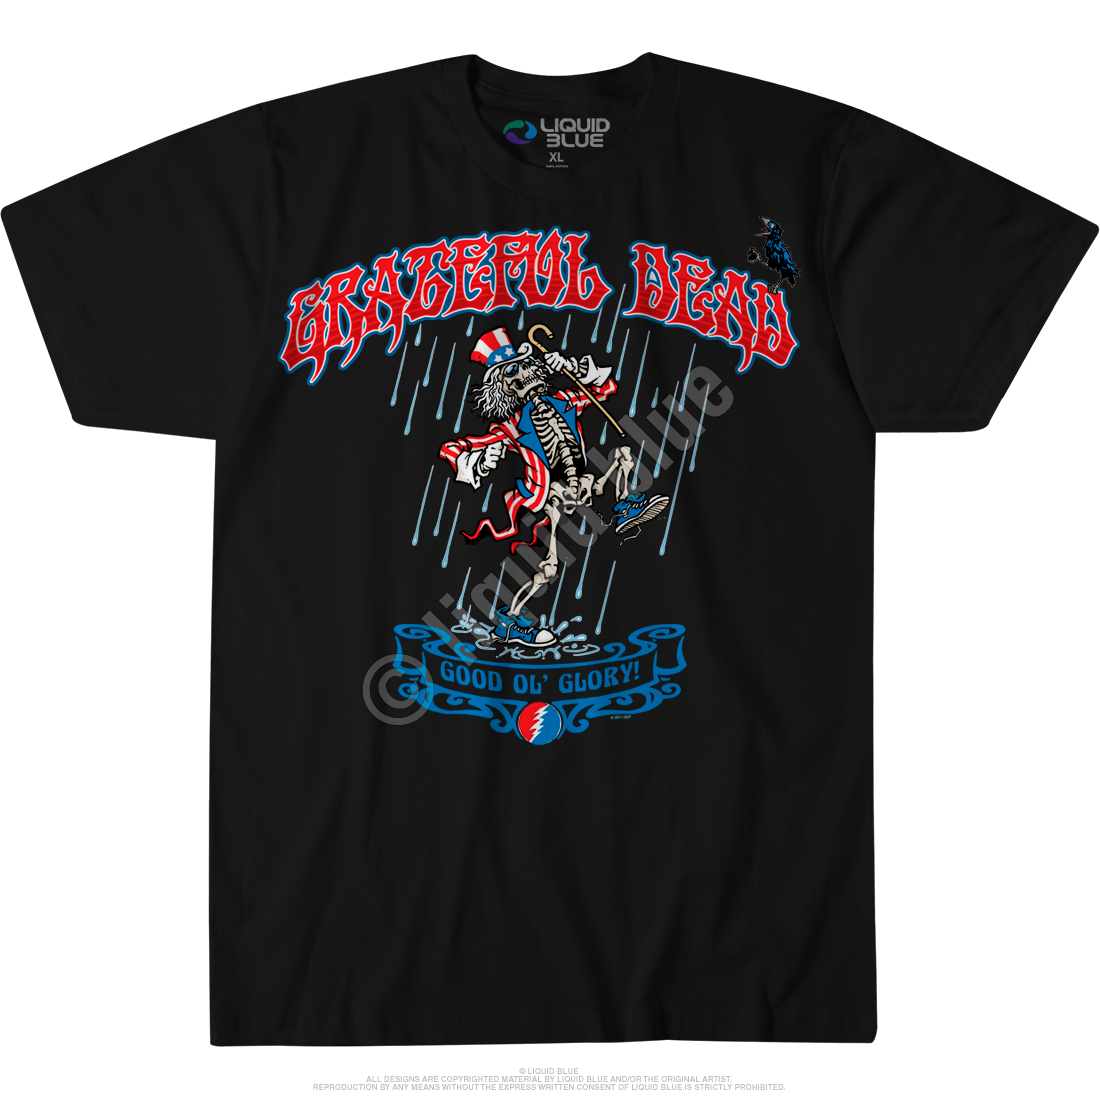 Good Ol Glory Custom T-Shirt